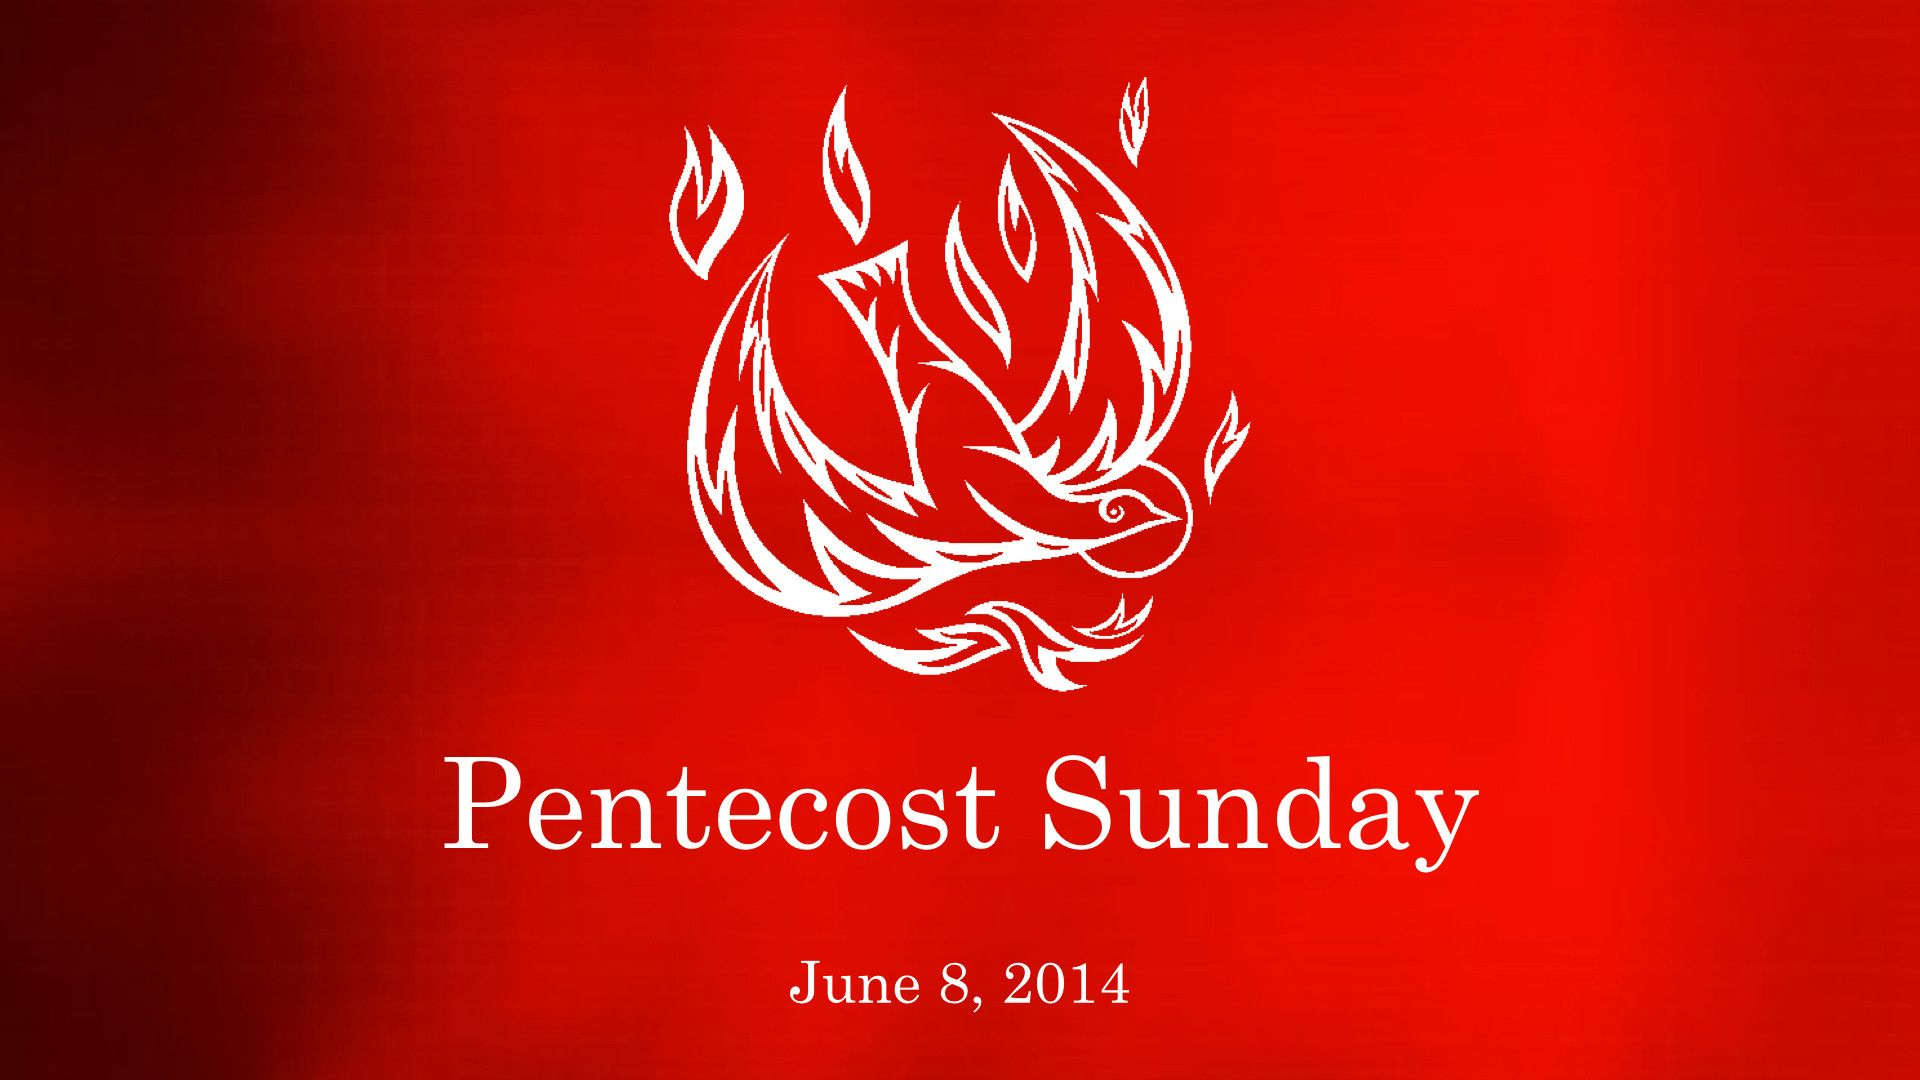 reminder  pentecost sunday  u2013 june 4  2017  u2013 wear red